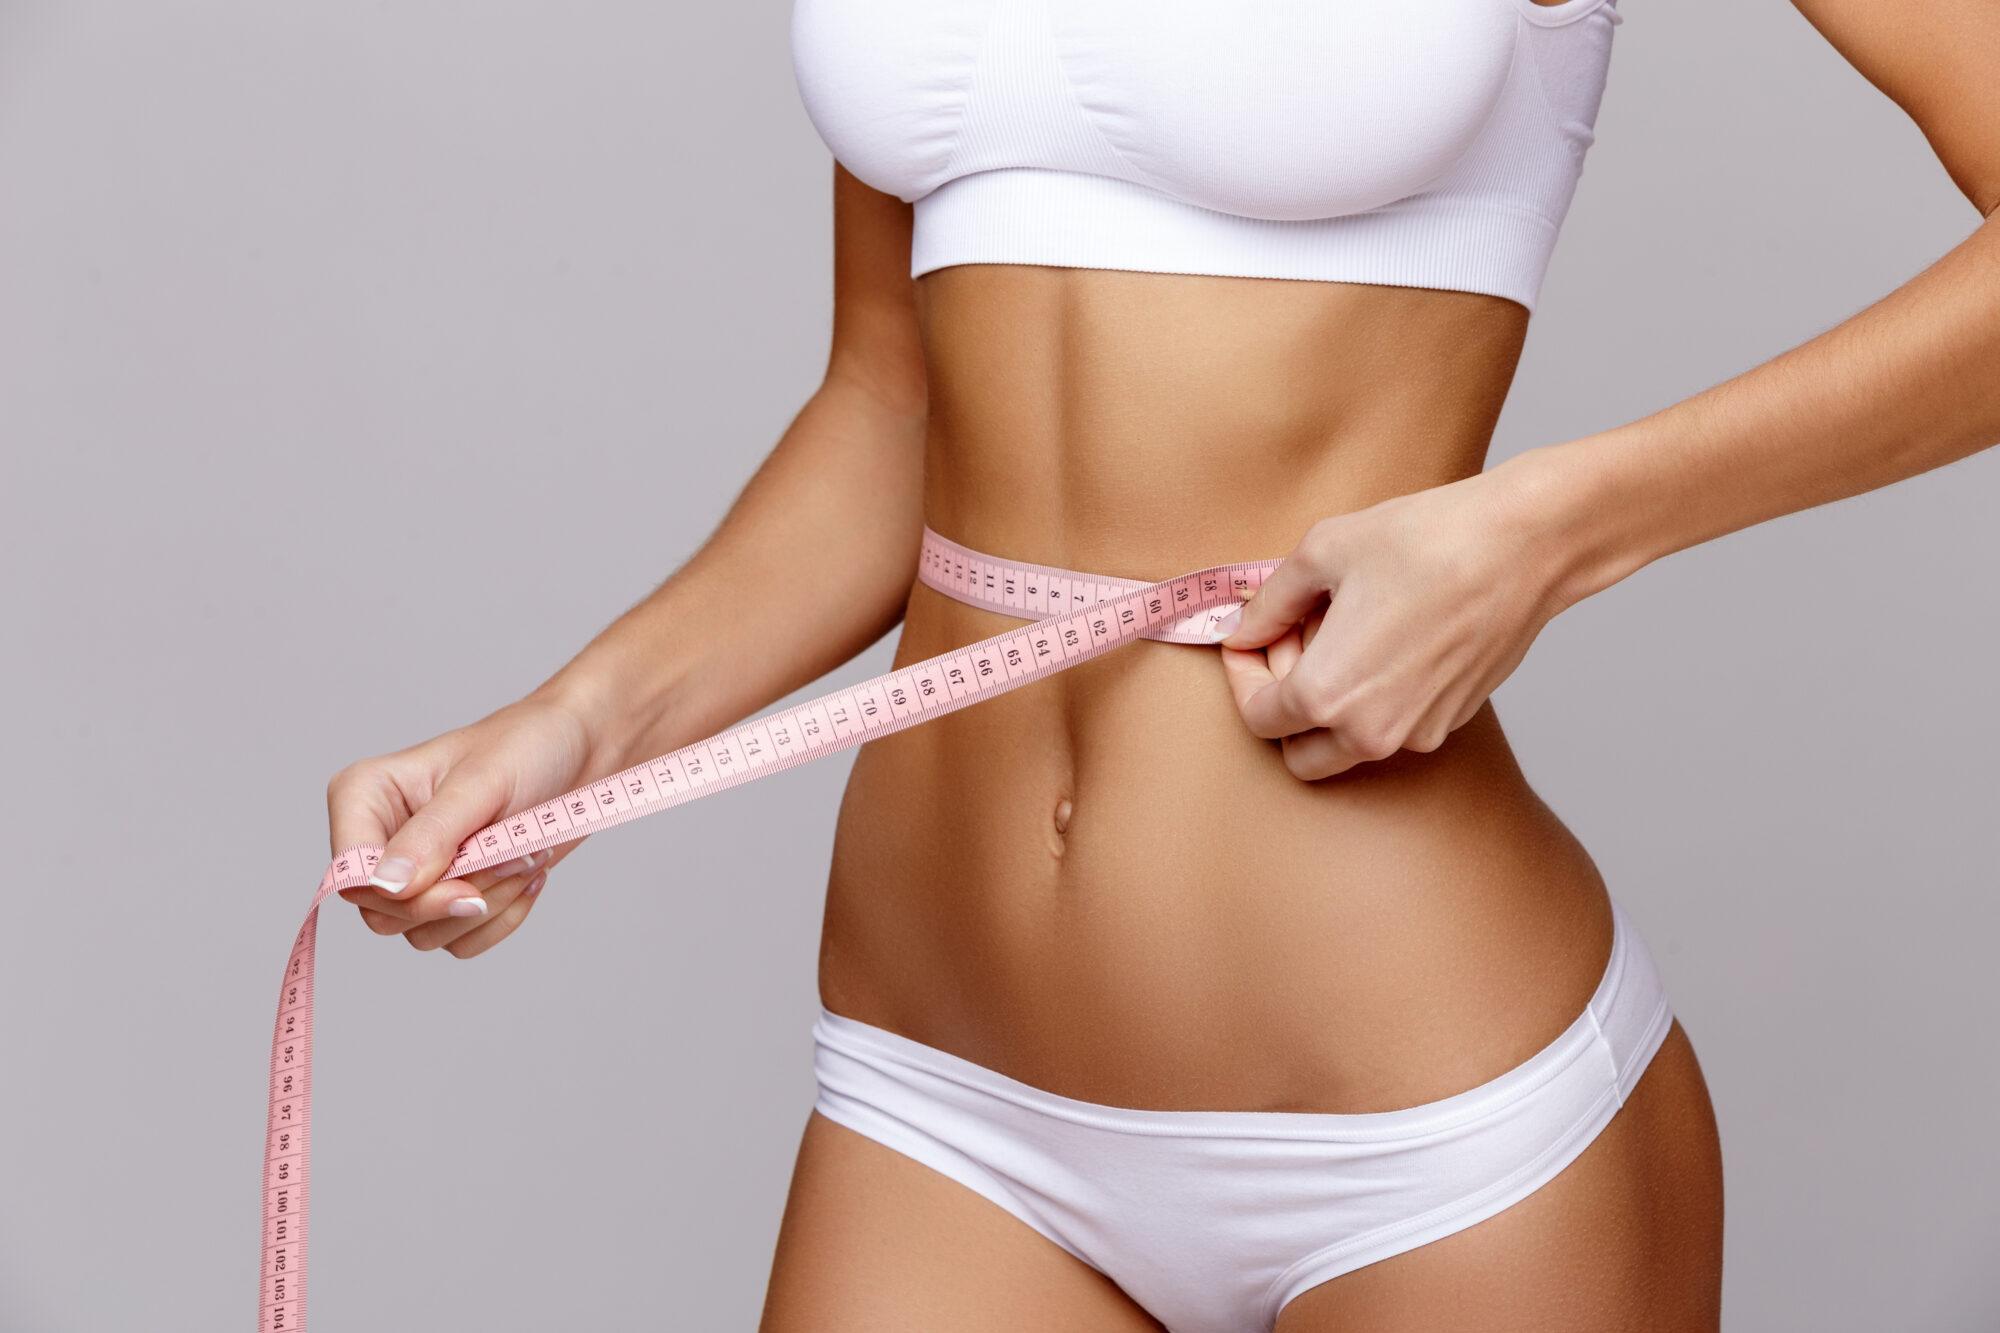 Cum sa slabesti dupa nastere - 7 sfaturi utile si dieta de 3 zile